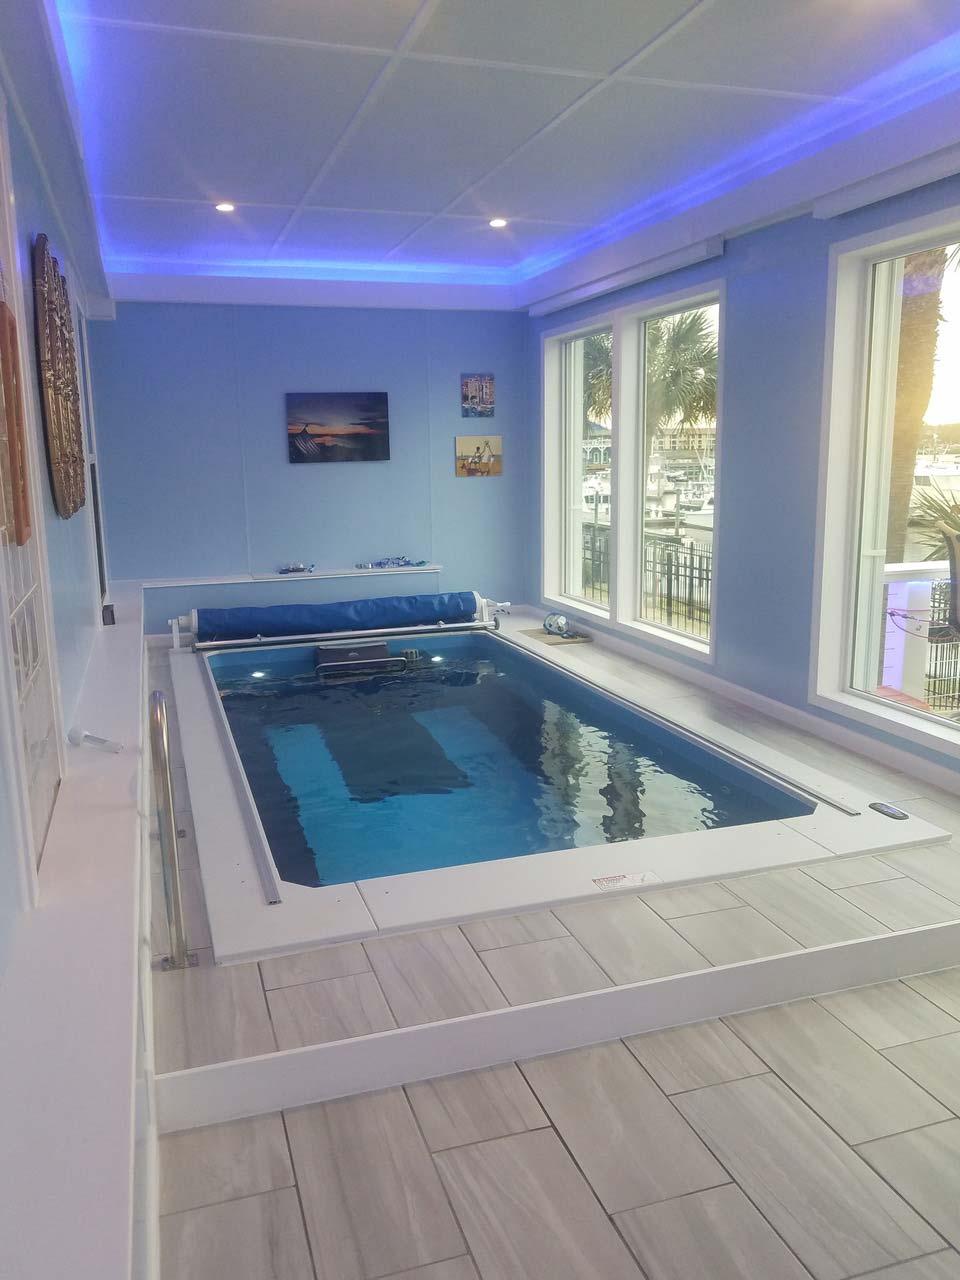 Original Endless Pool Endless Pools Boldt Pools Amp Spas